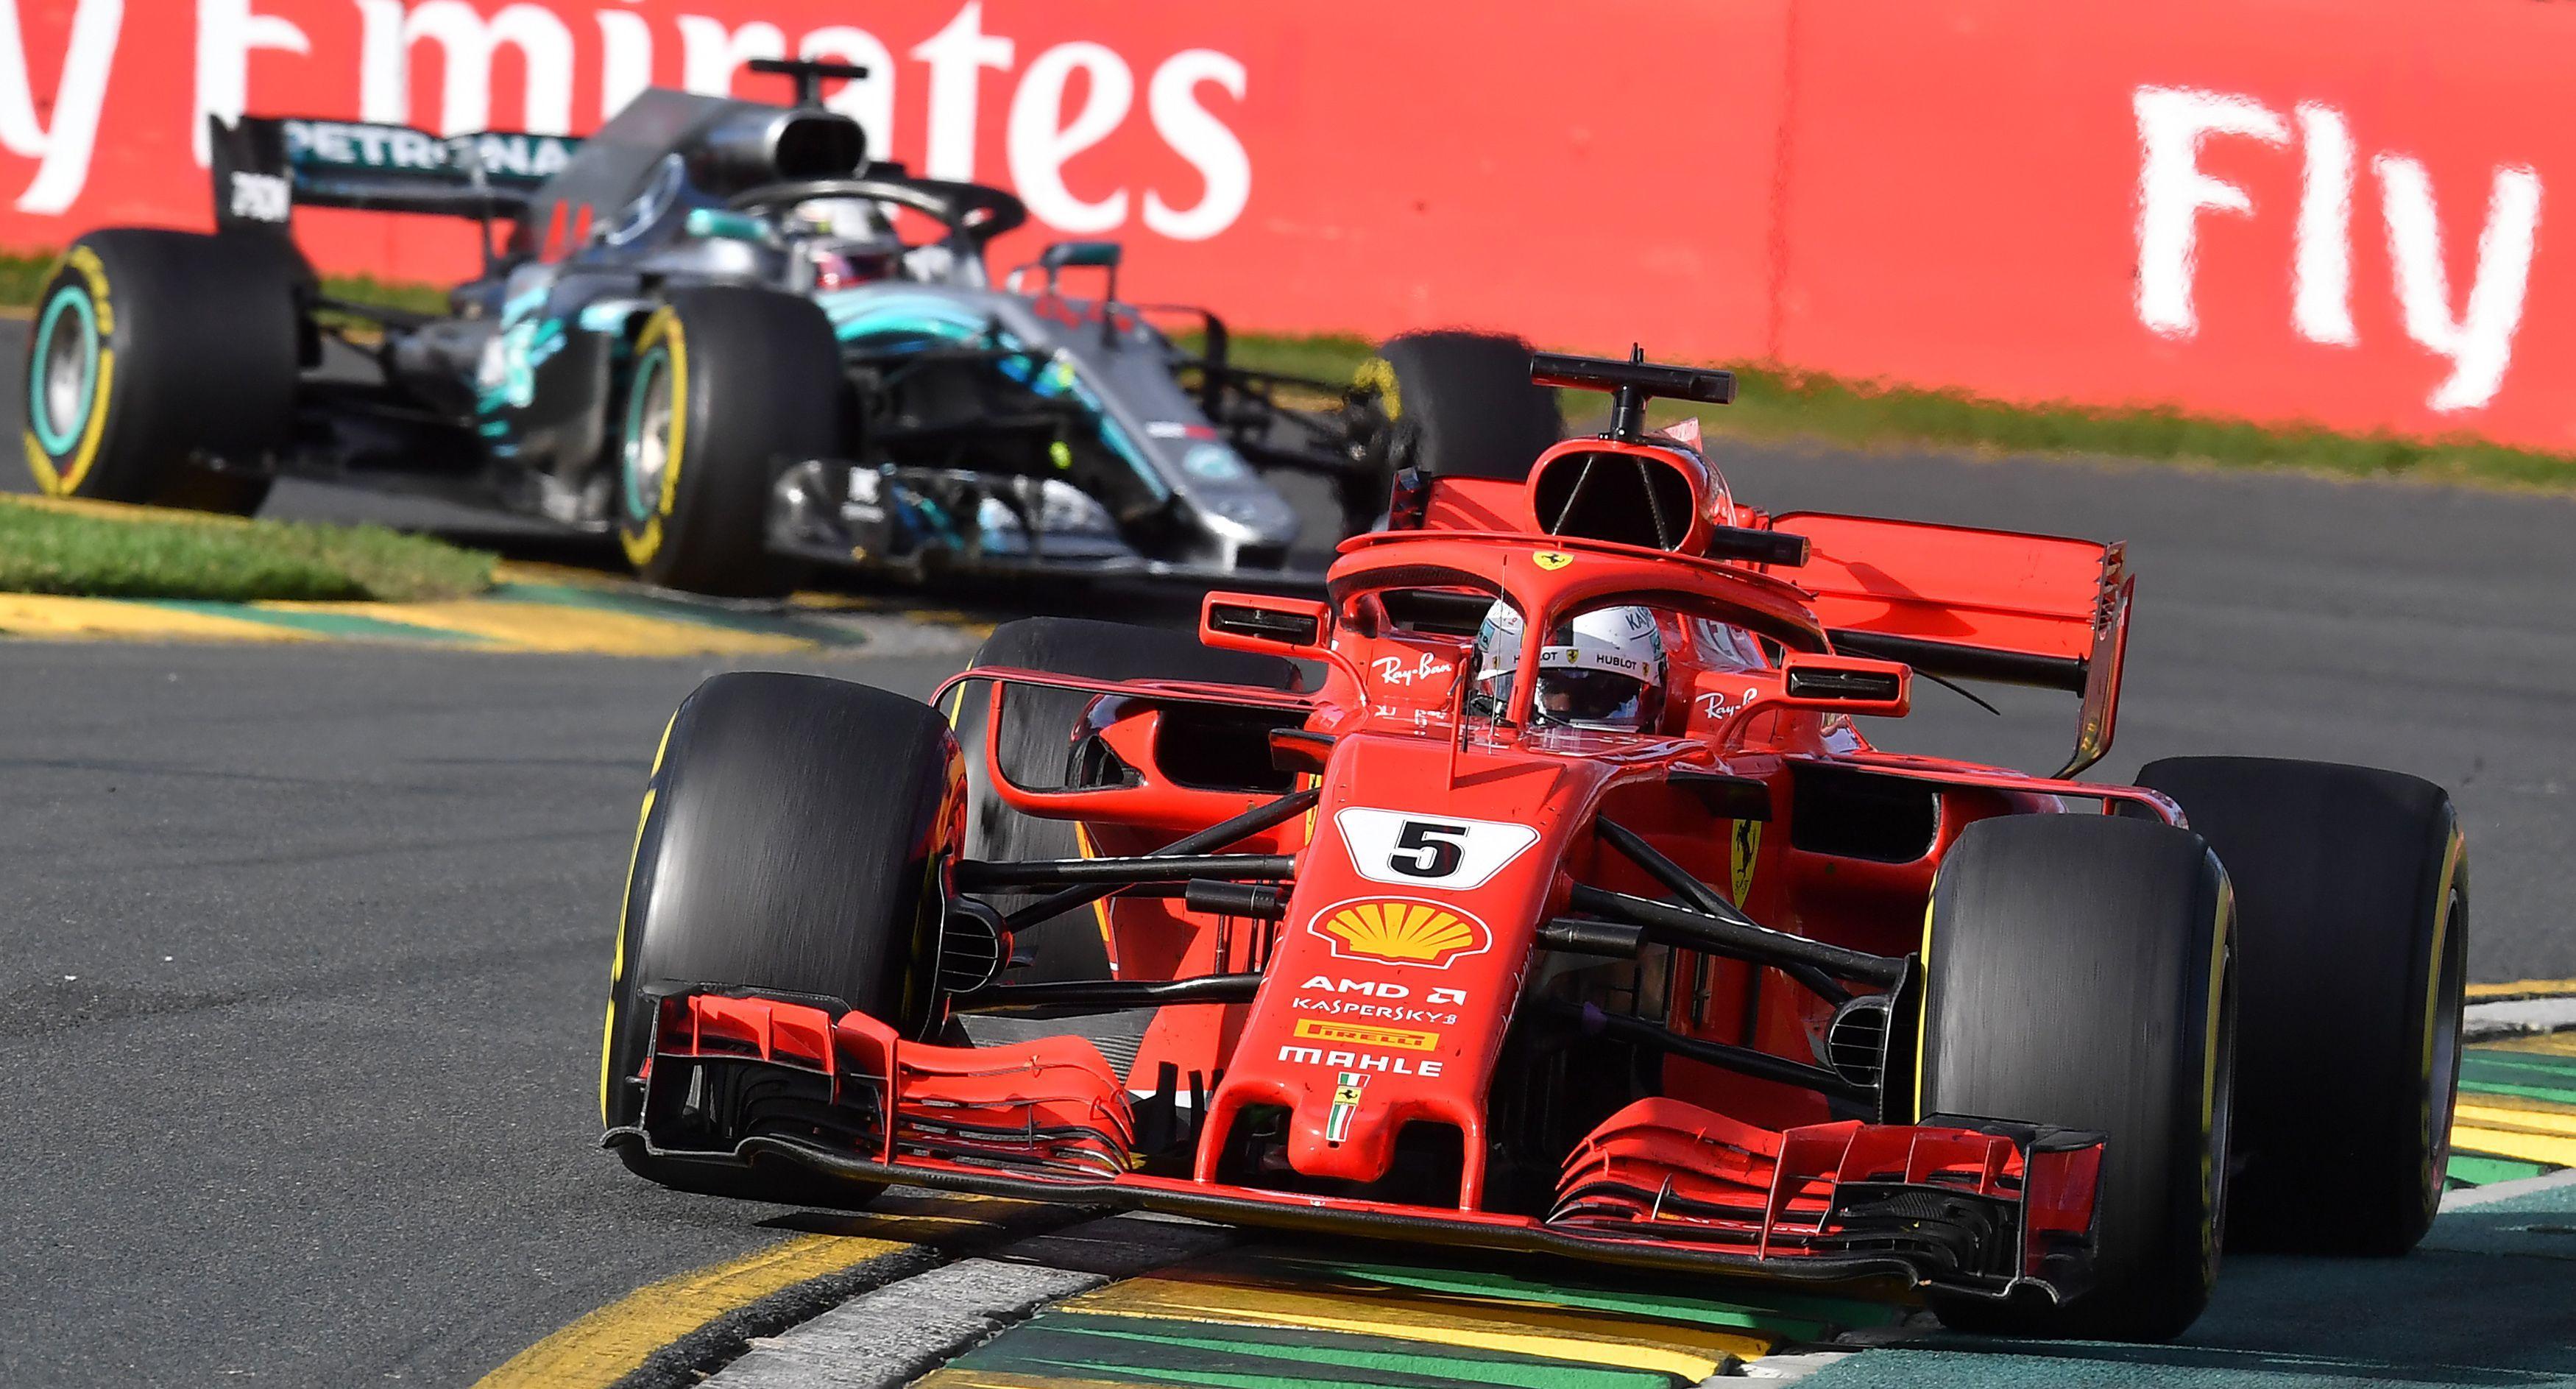 Sebastian Vettel took full advantage of Mercedes' blunder to win the first race of the season